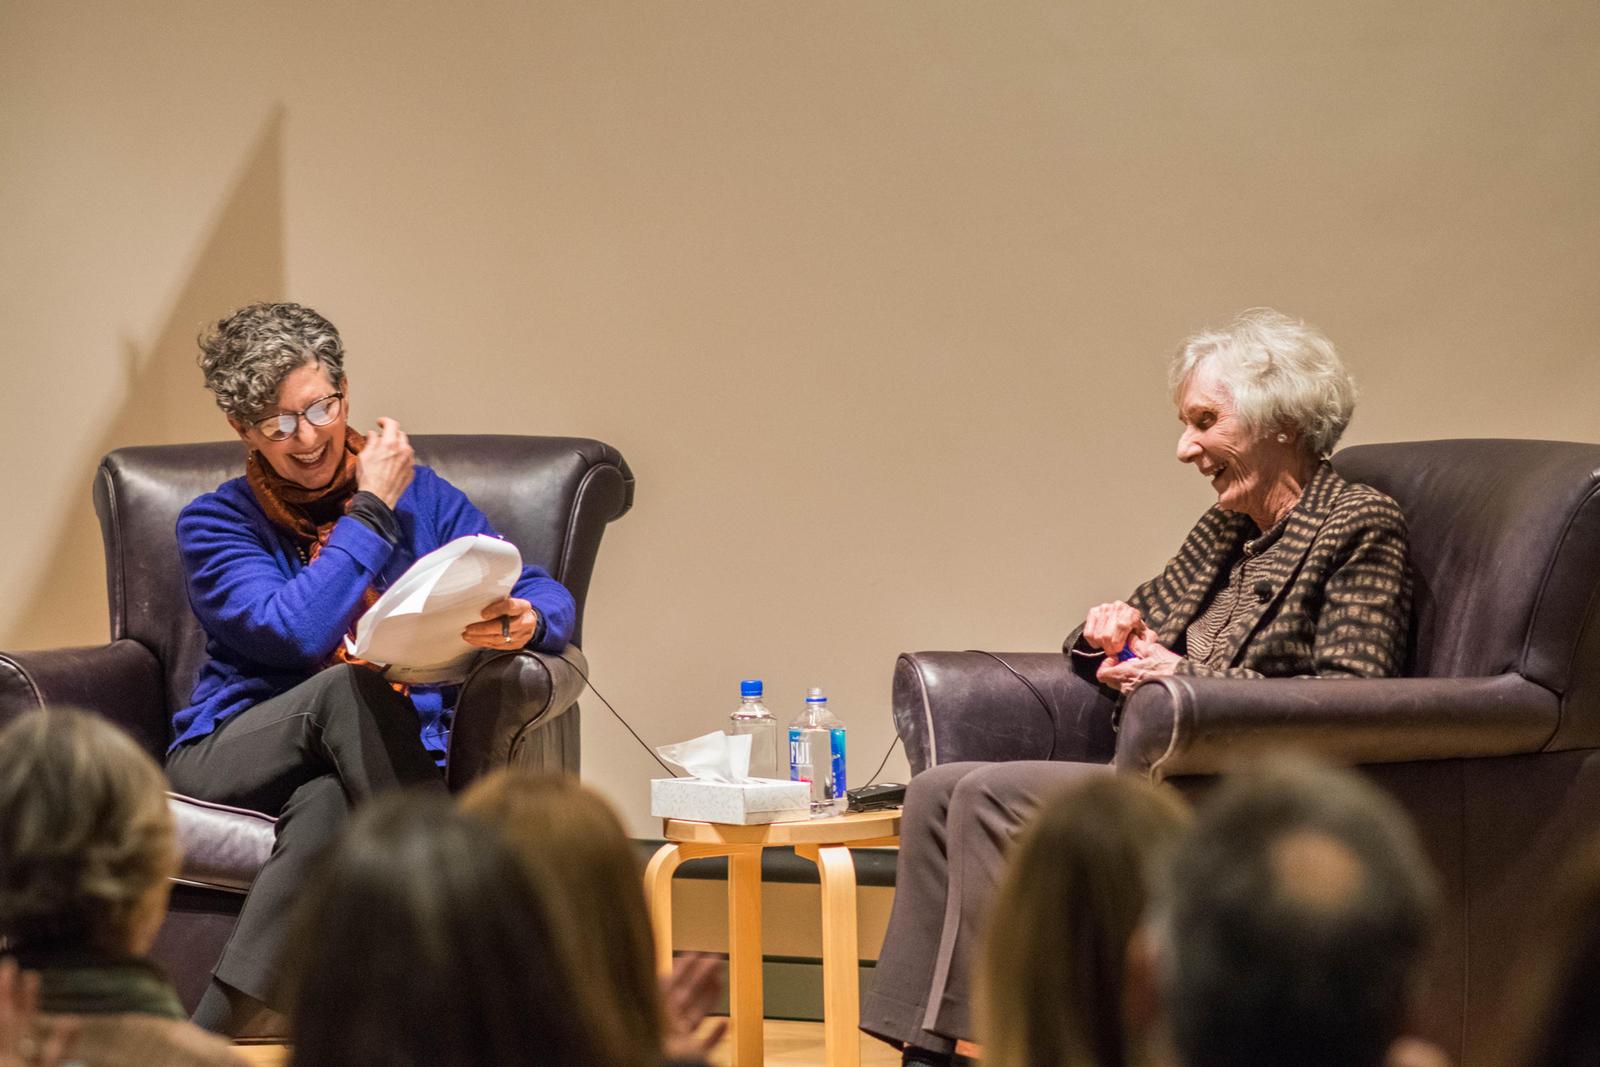 Marcie Sillman interviewing Virginia Wright.